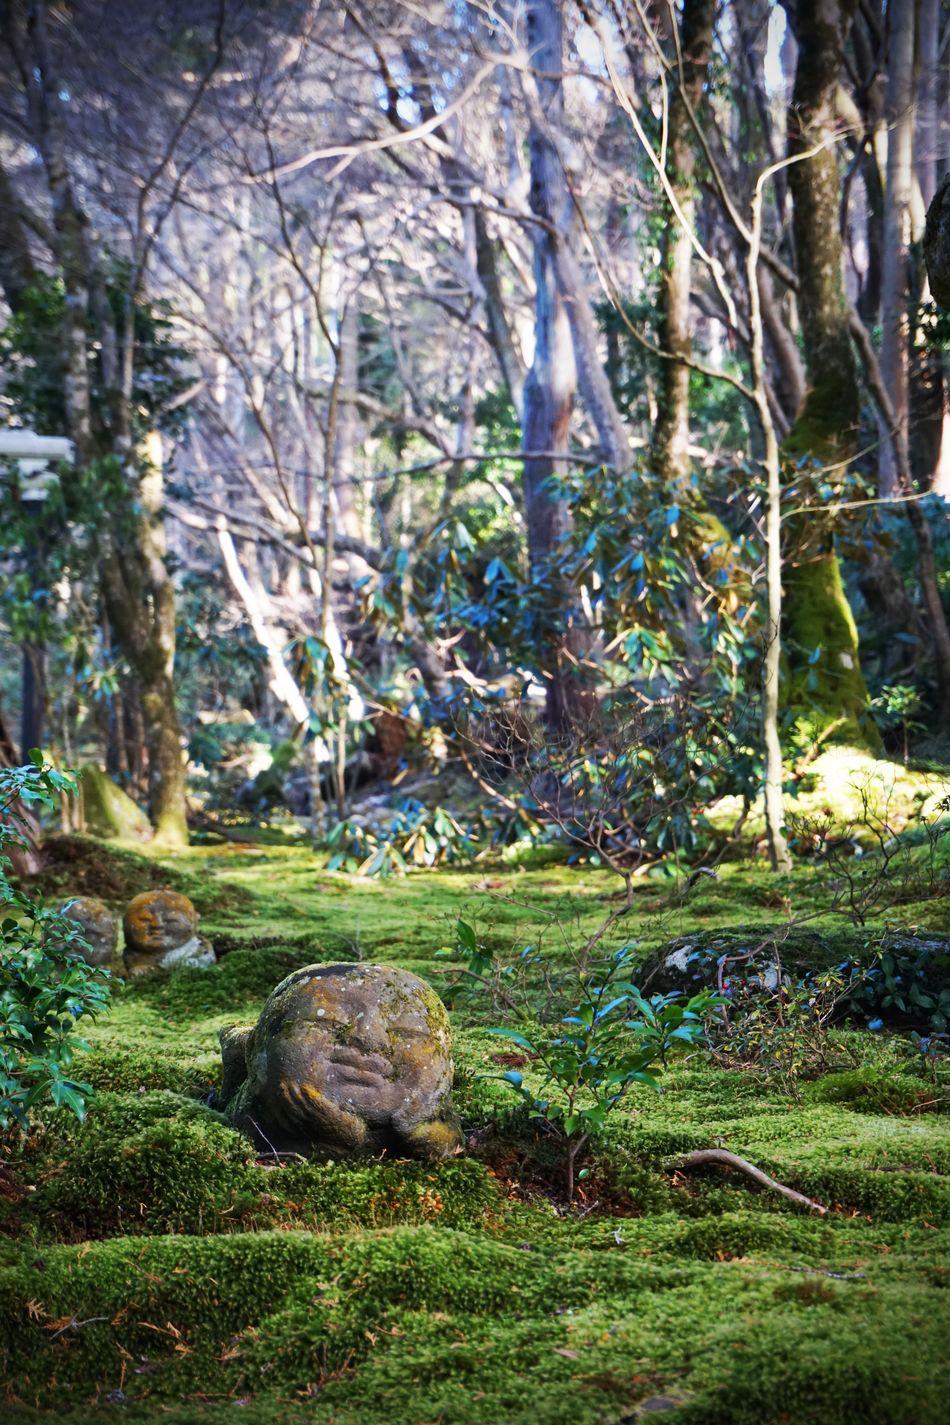 2017 Forest Green Japan Jizo Kyoto Moss Nature Ohara Sanzen-in Sanzen-in Temple Statue Tree Warabe-Jizo わらべ地蔵 京都 地蔵 大原三千院 Temple